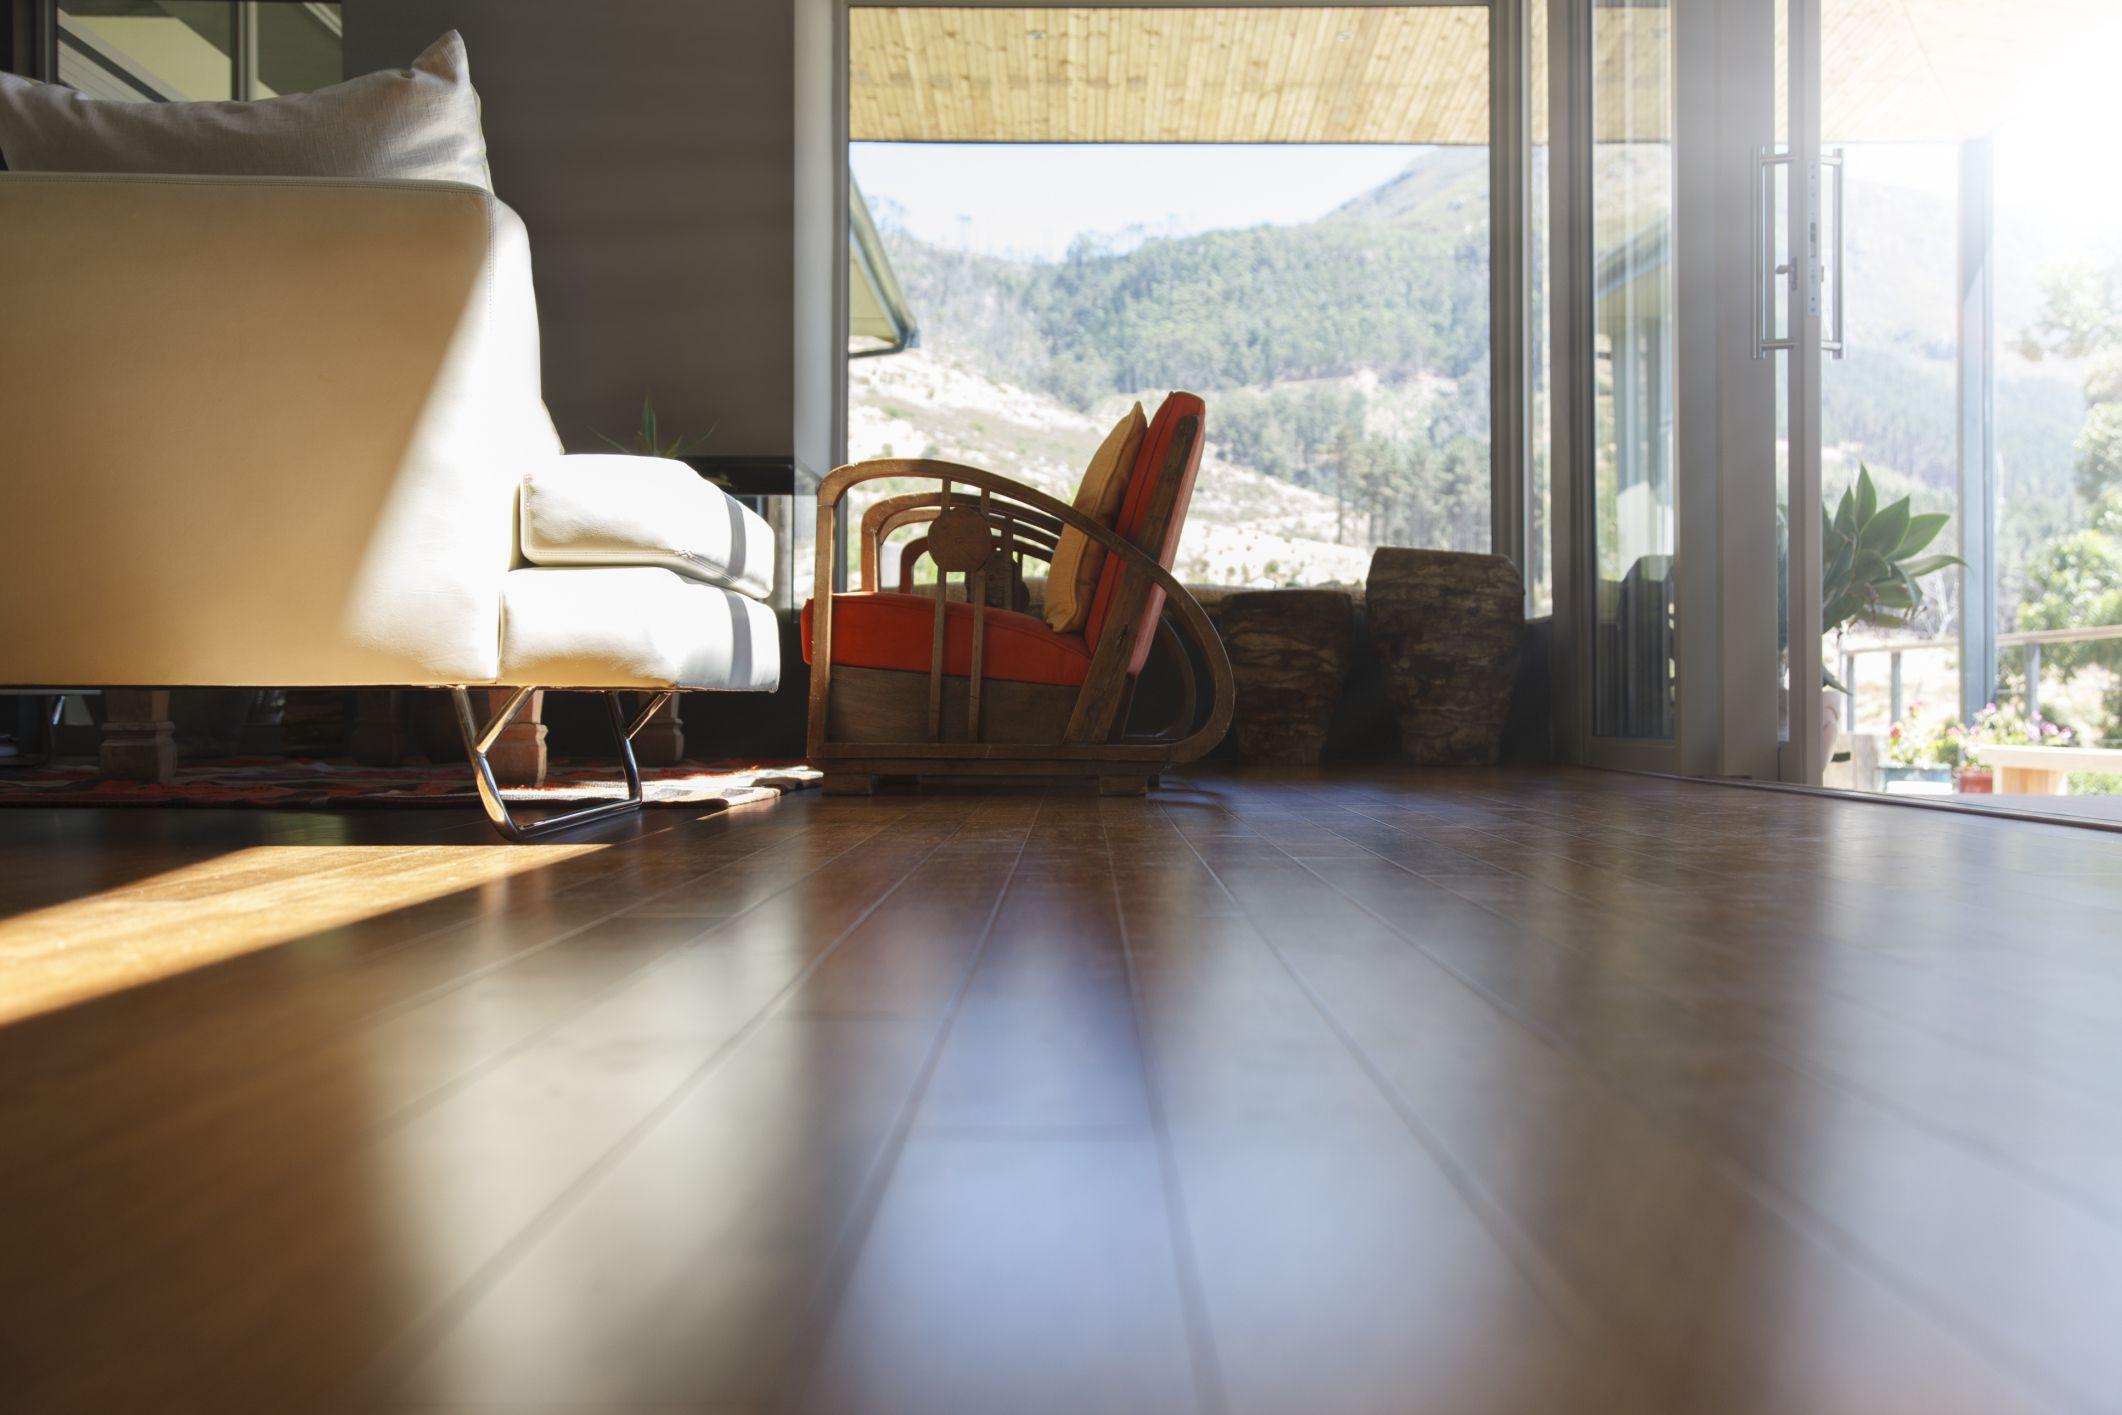 10 Great Best Engineered Hardwood Flooring Canada 2021 free download best engineered hardwood flooring canada of pros and cons of bellawood flooring from lumber liquidators for exotic hardwood flooring 525439899 56a49d3a3df78cf77283453d